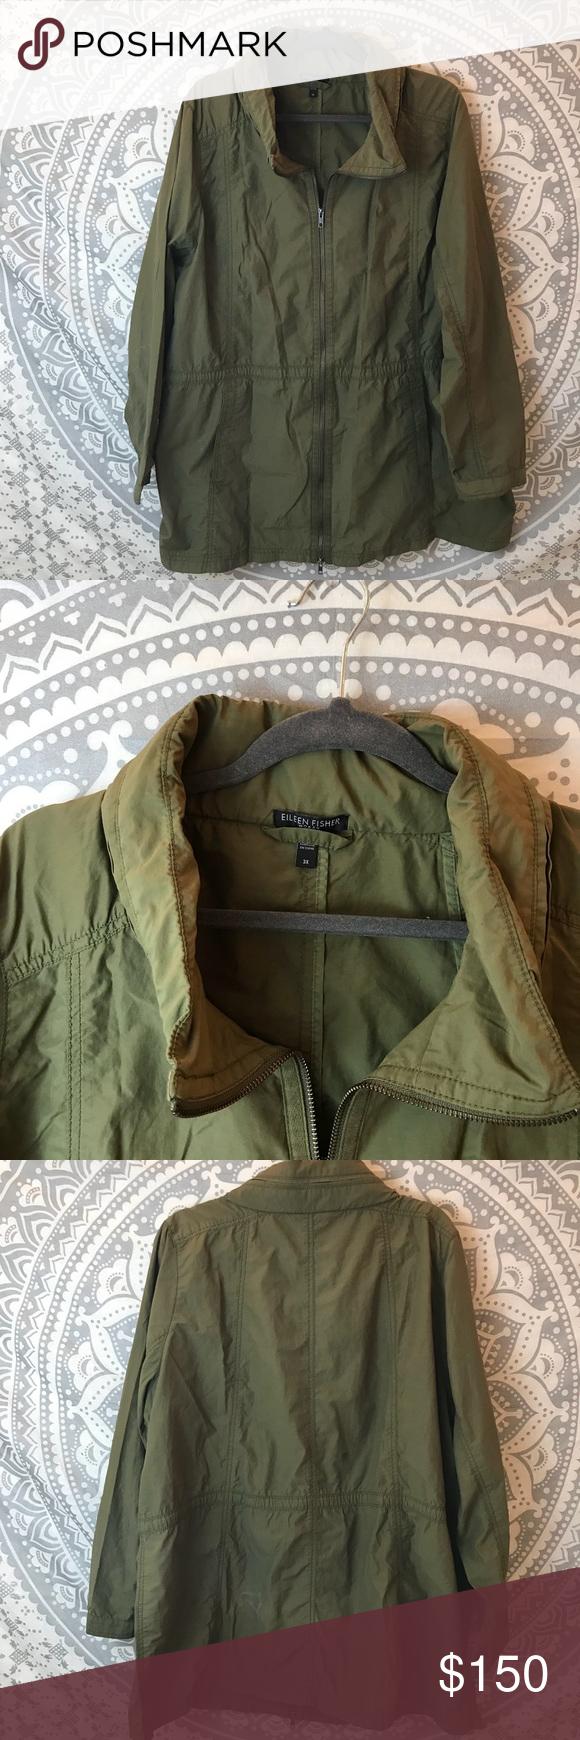 Eileen Fisher Jacket Eileen Fisher Jacket Jackets Raincoats For Women [ 1740 x 580 Pixel ]